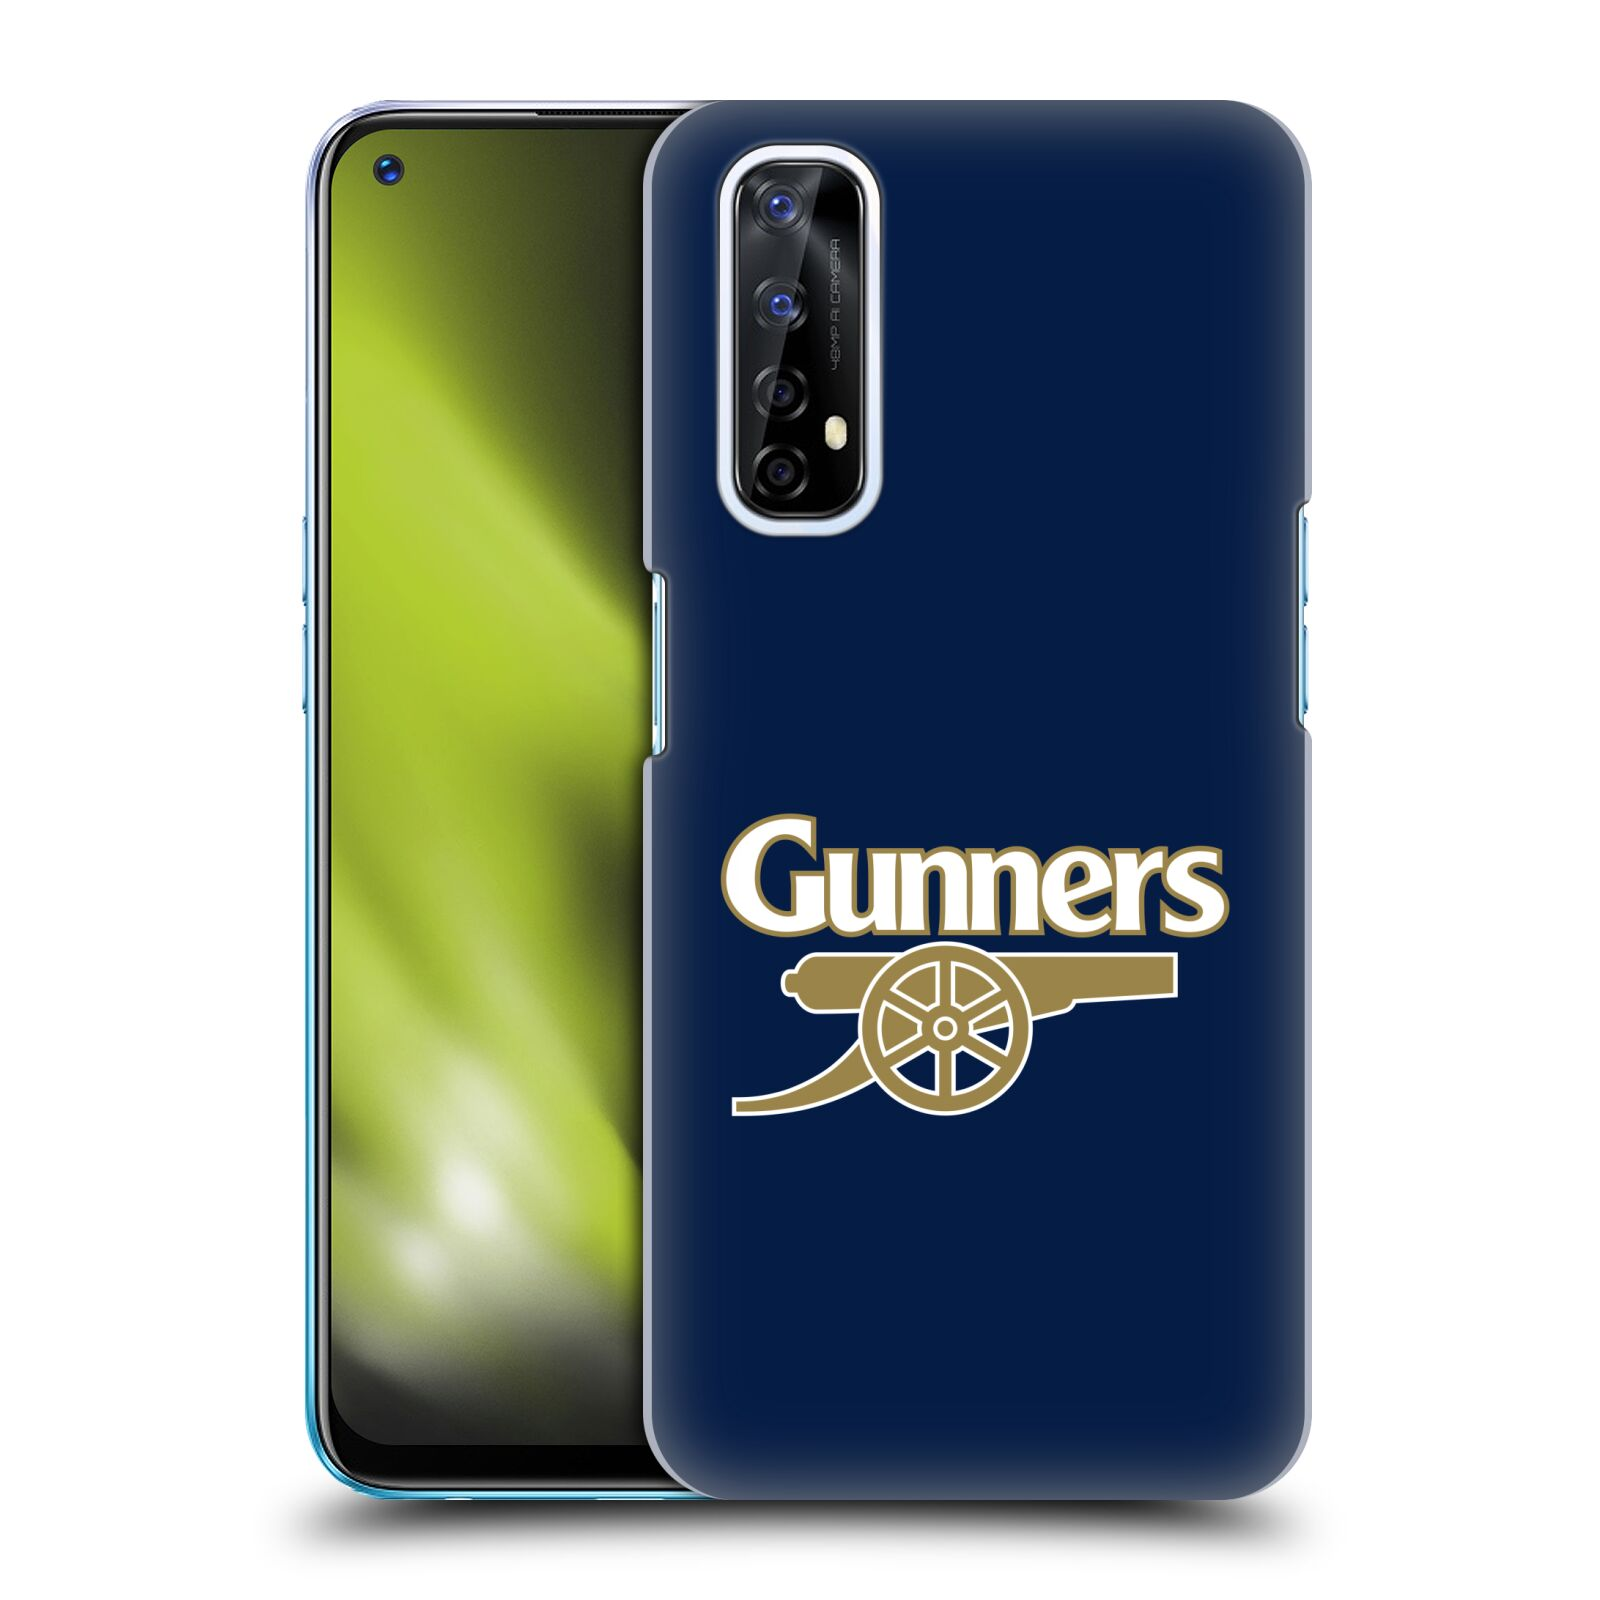 Plastové pouzdro na mobil Realme 7 - Head Case - Arsenal FC - Gunners